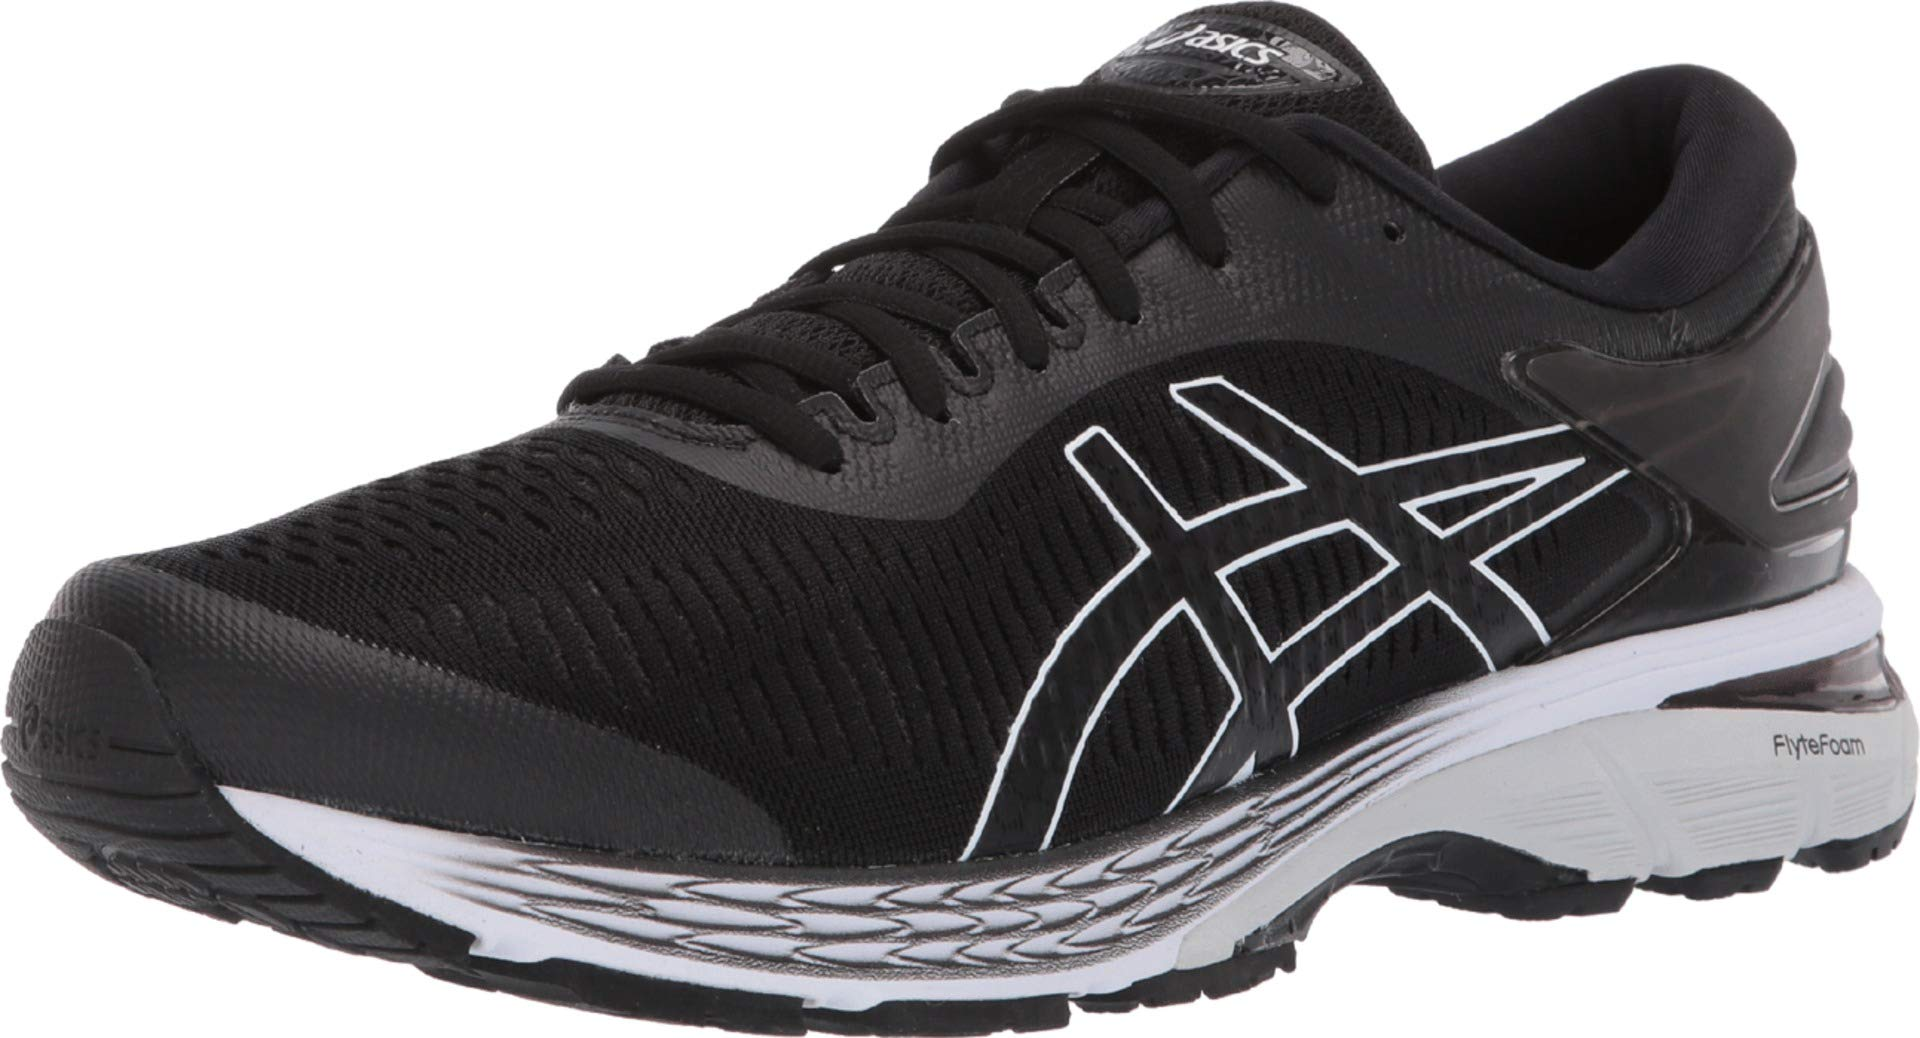 ASICS Gel Kayano 25 Men's Running Shoe, Black/Glacier Grey, 6 D US by ASICS (Image #1)